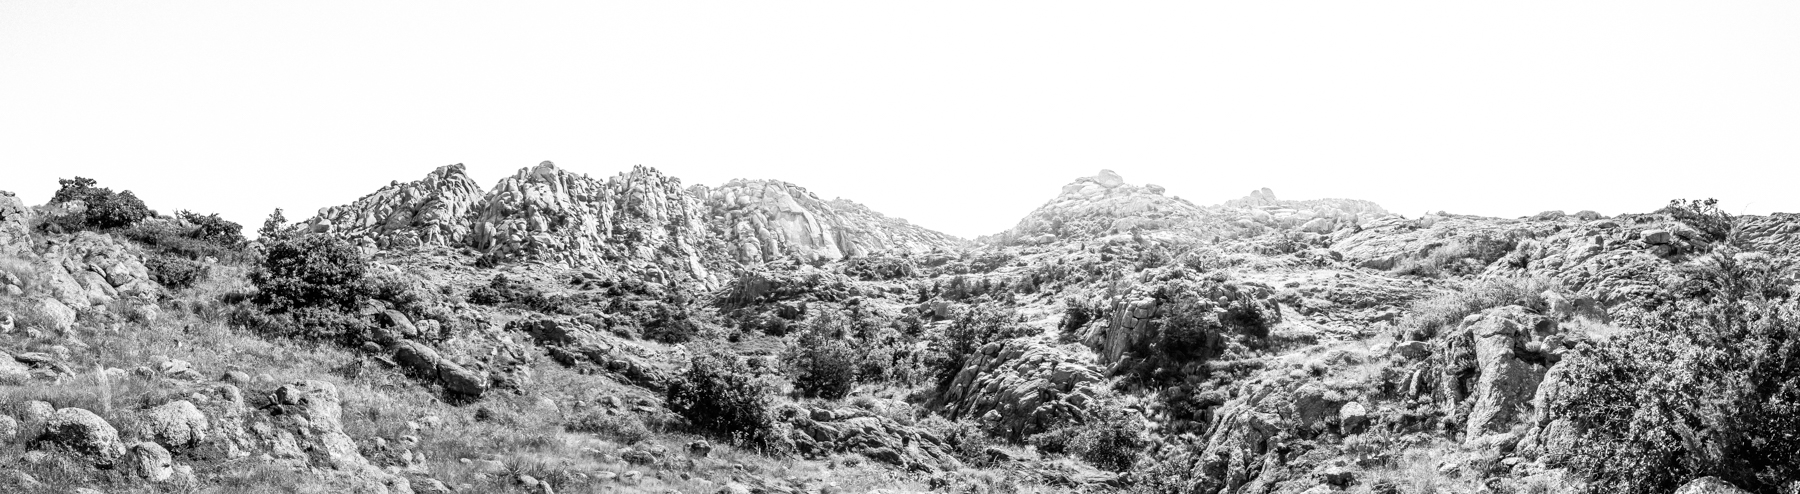 2017-06-25 Mount Lincoln B (3 of 20).jpg